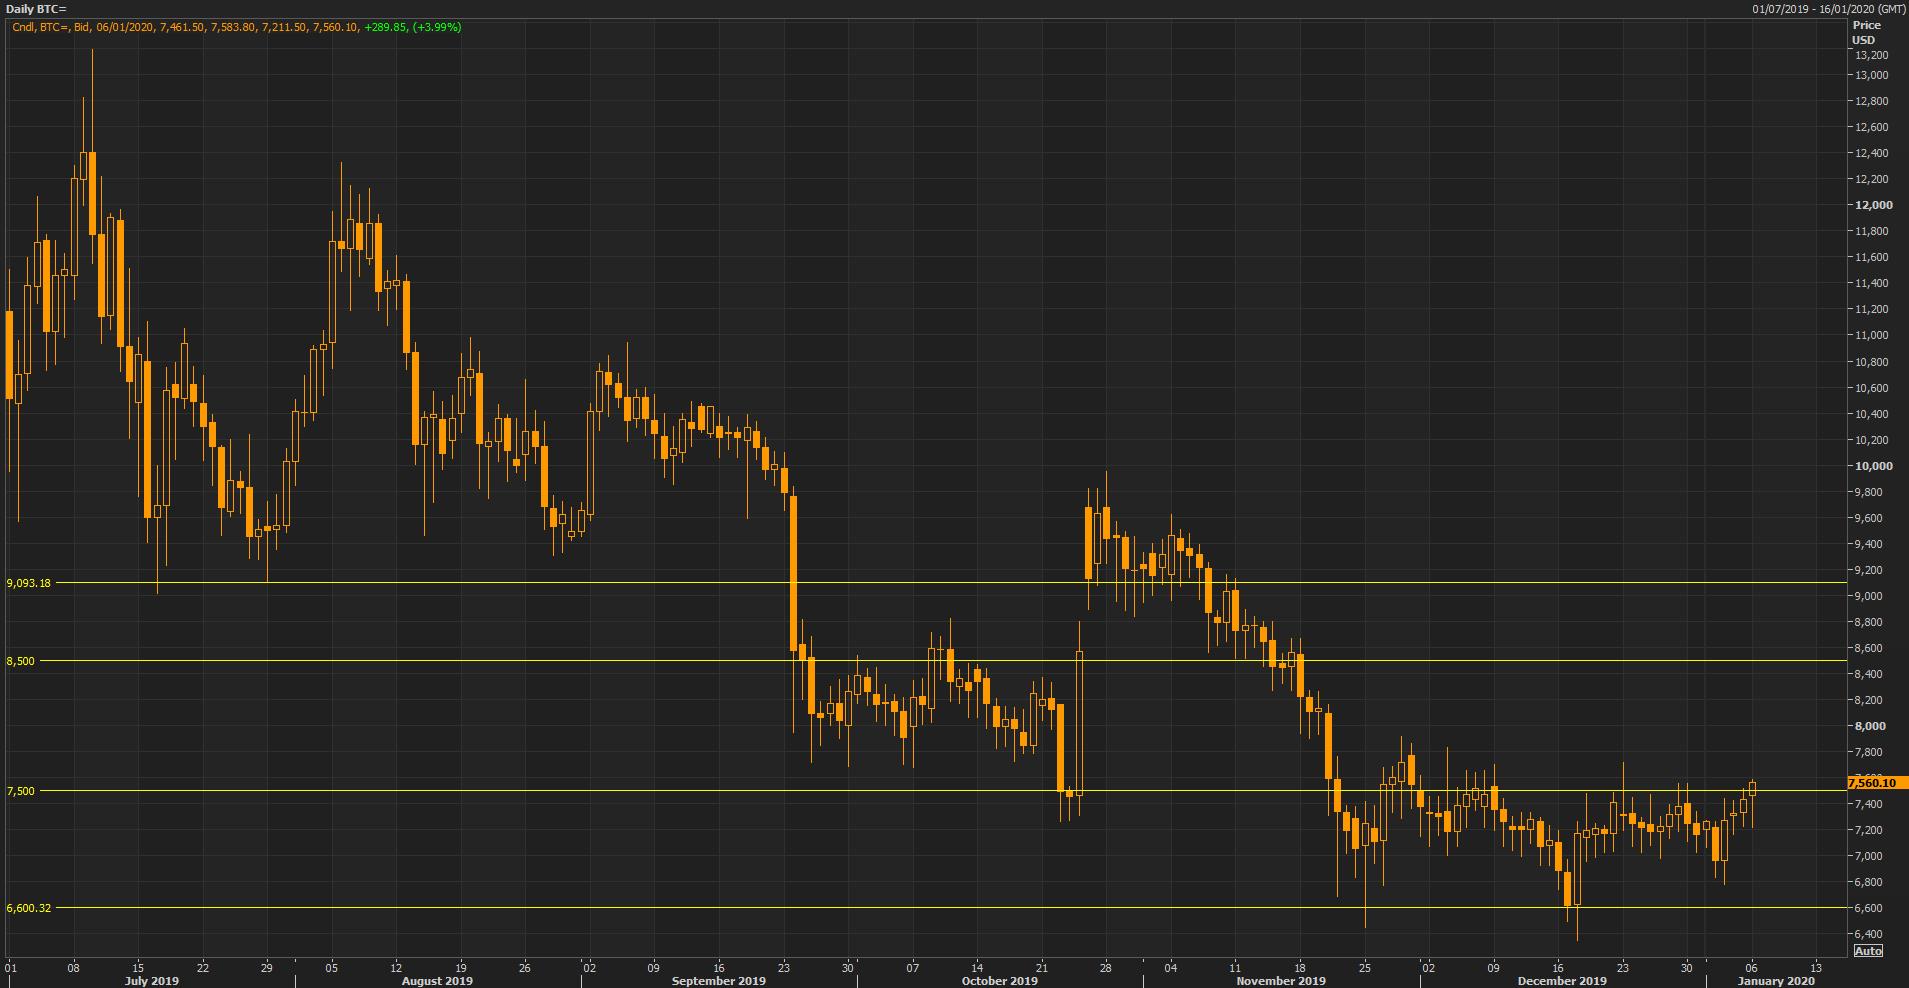 European Update  Usiran, Oil, Gold, Bitcoin for Hong Kong Economic Calendar